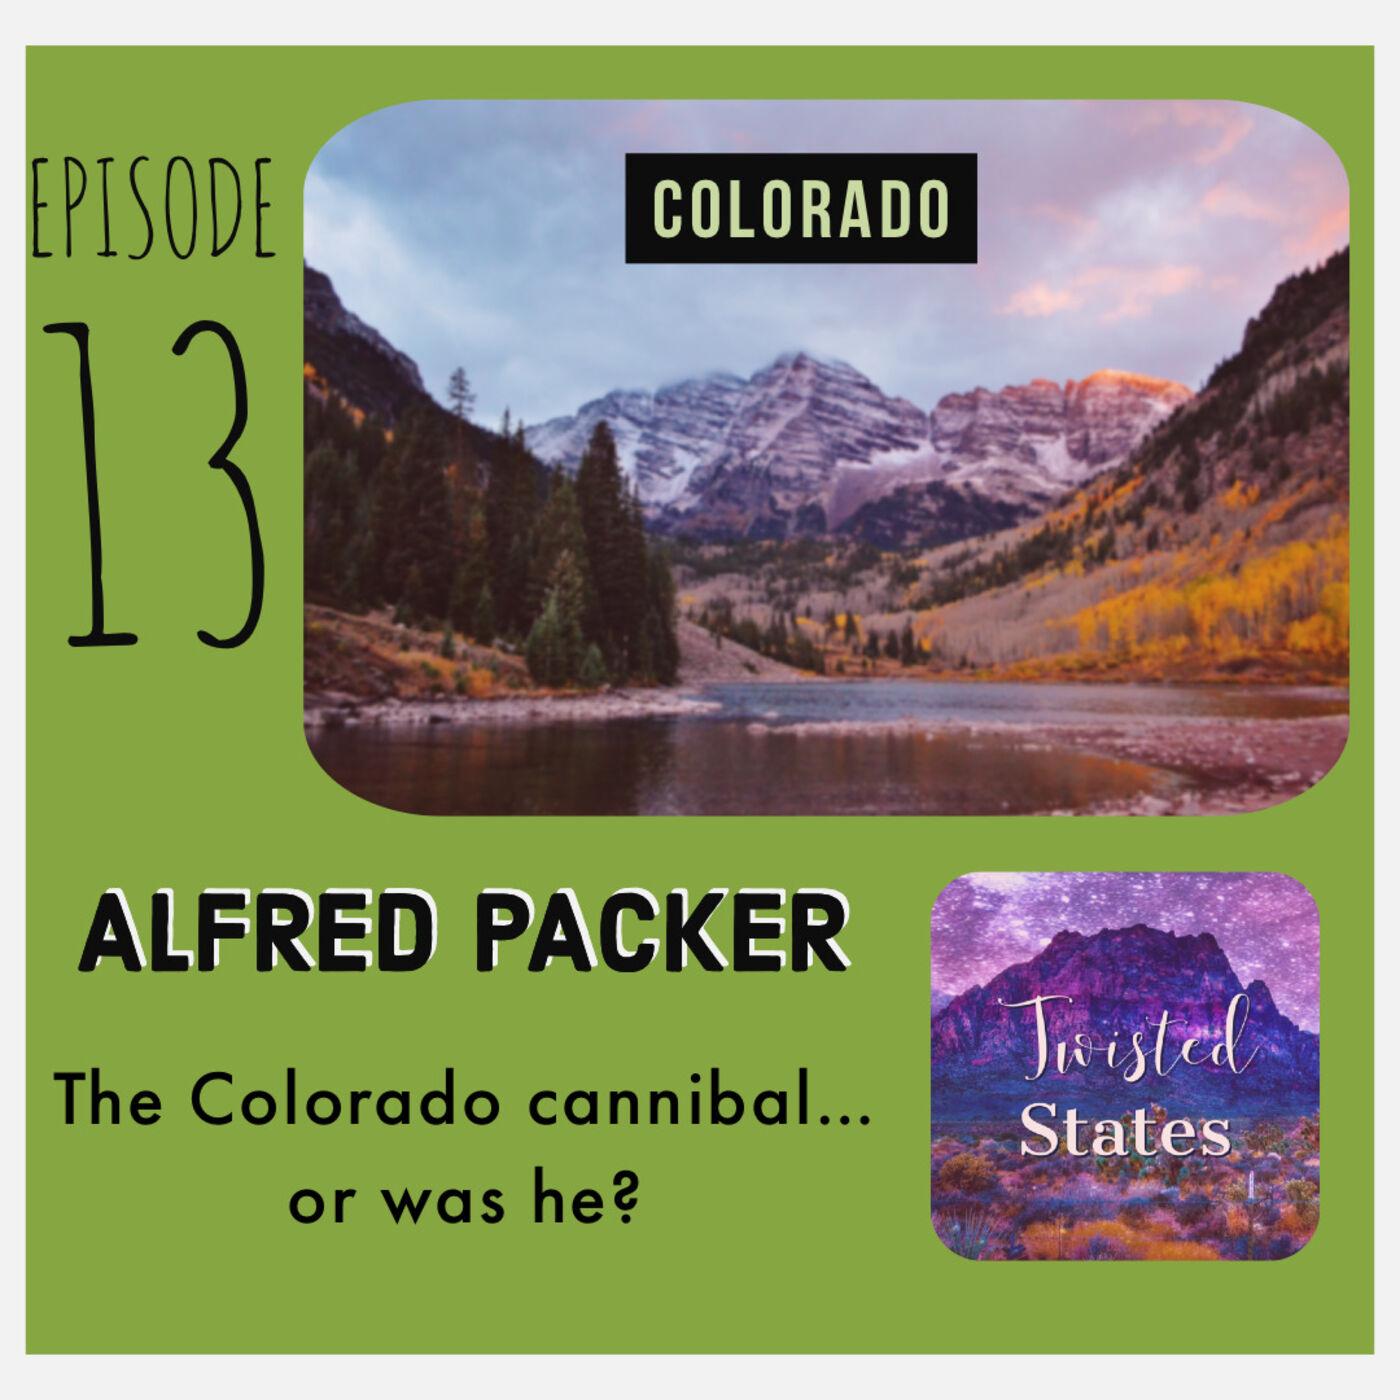 Episode 13 Colorado Alferd Packer The Colorado Cannibal